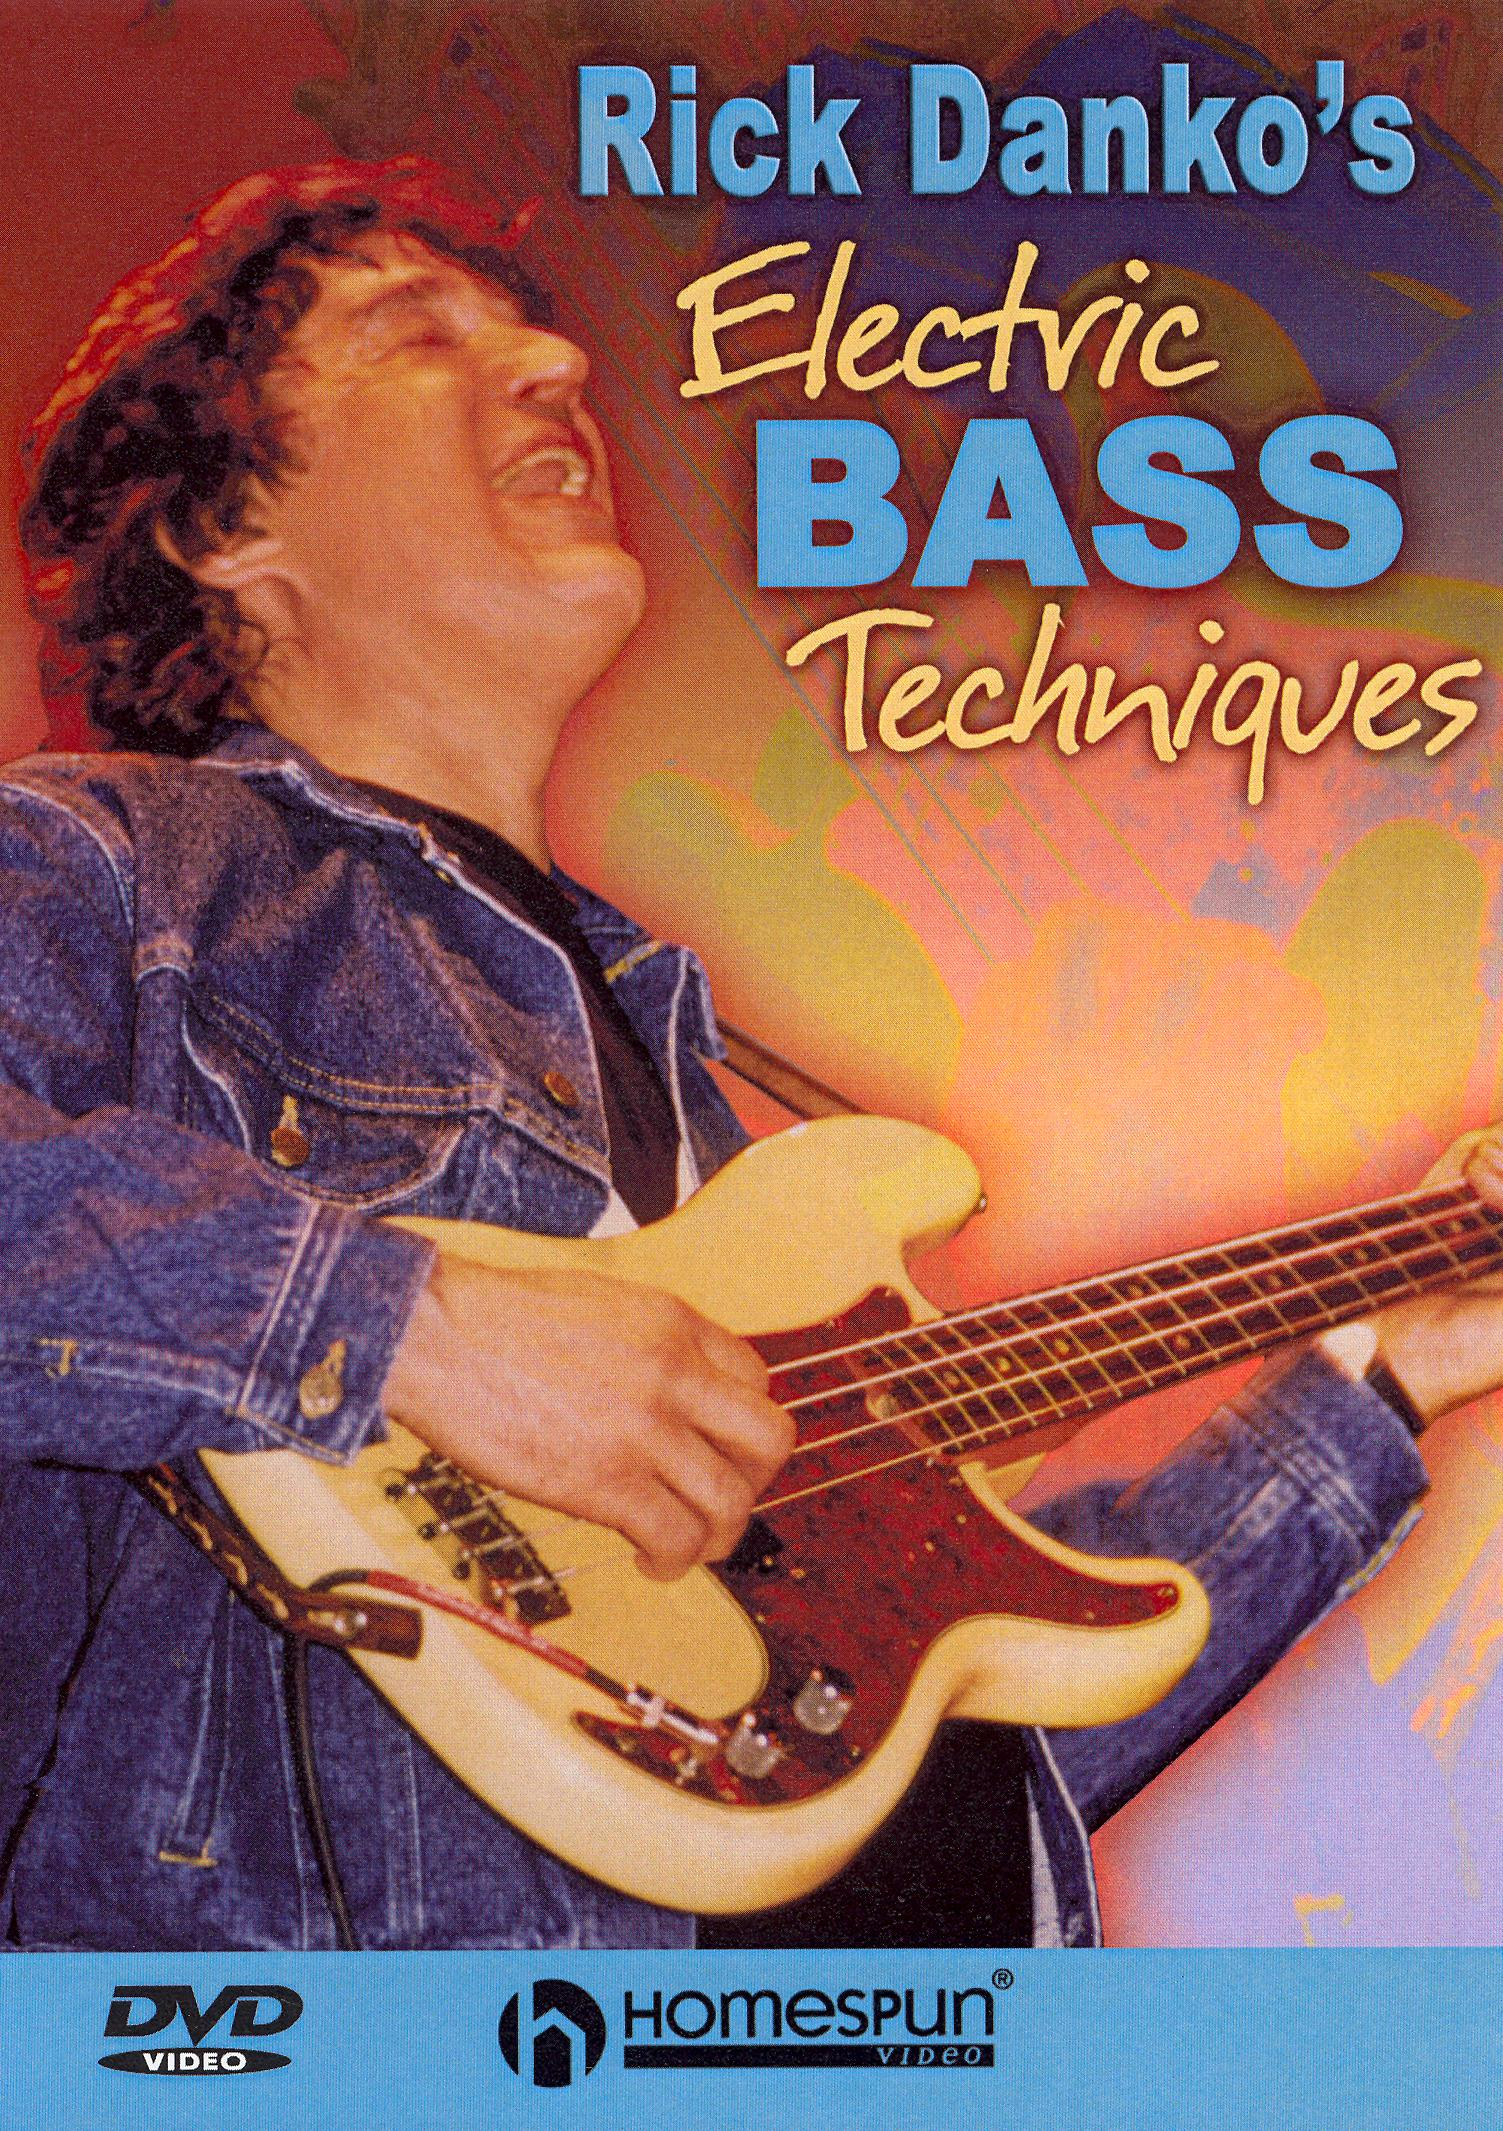 Rick Danko's Electric Bass Techniques